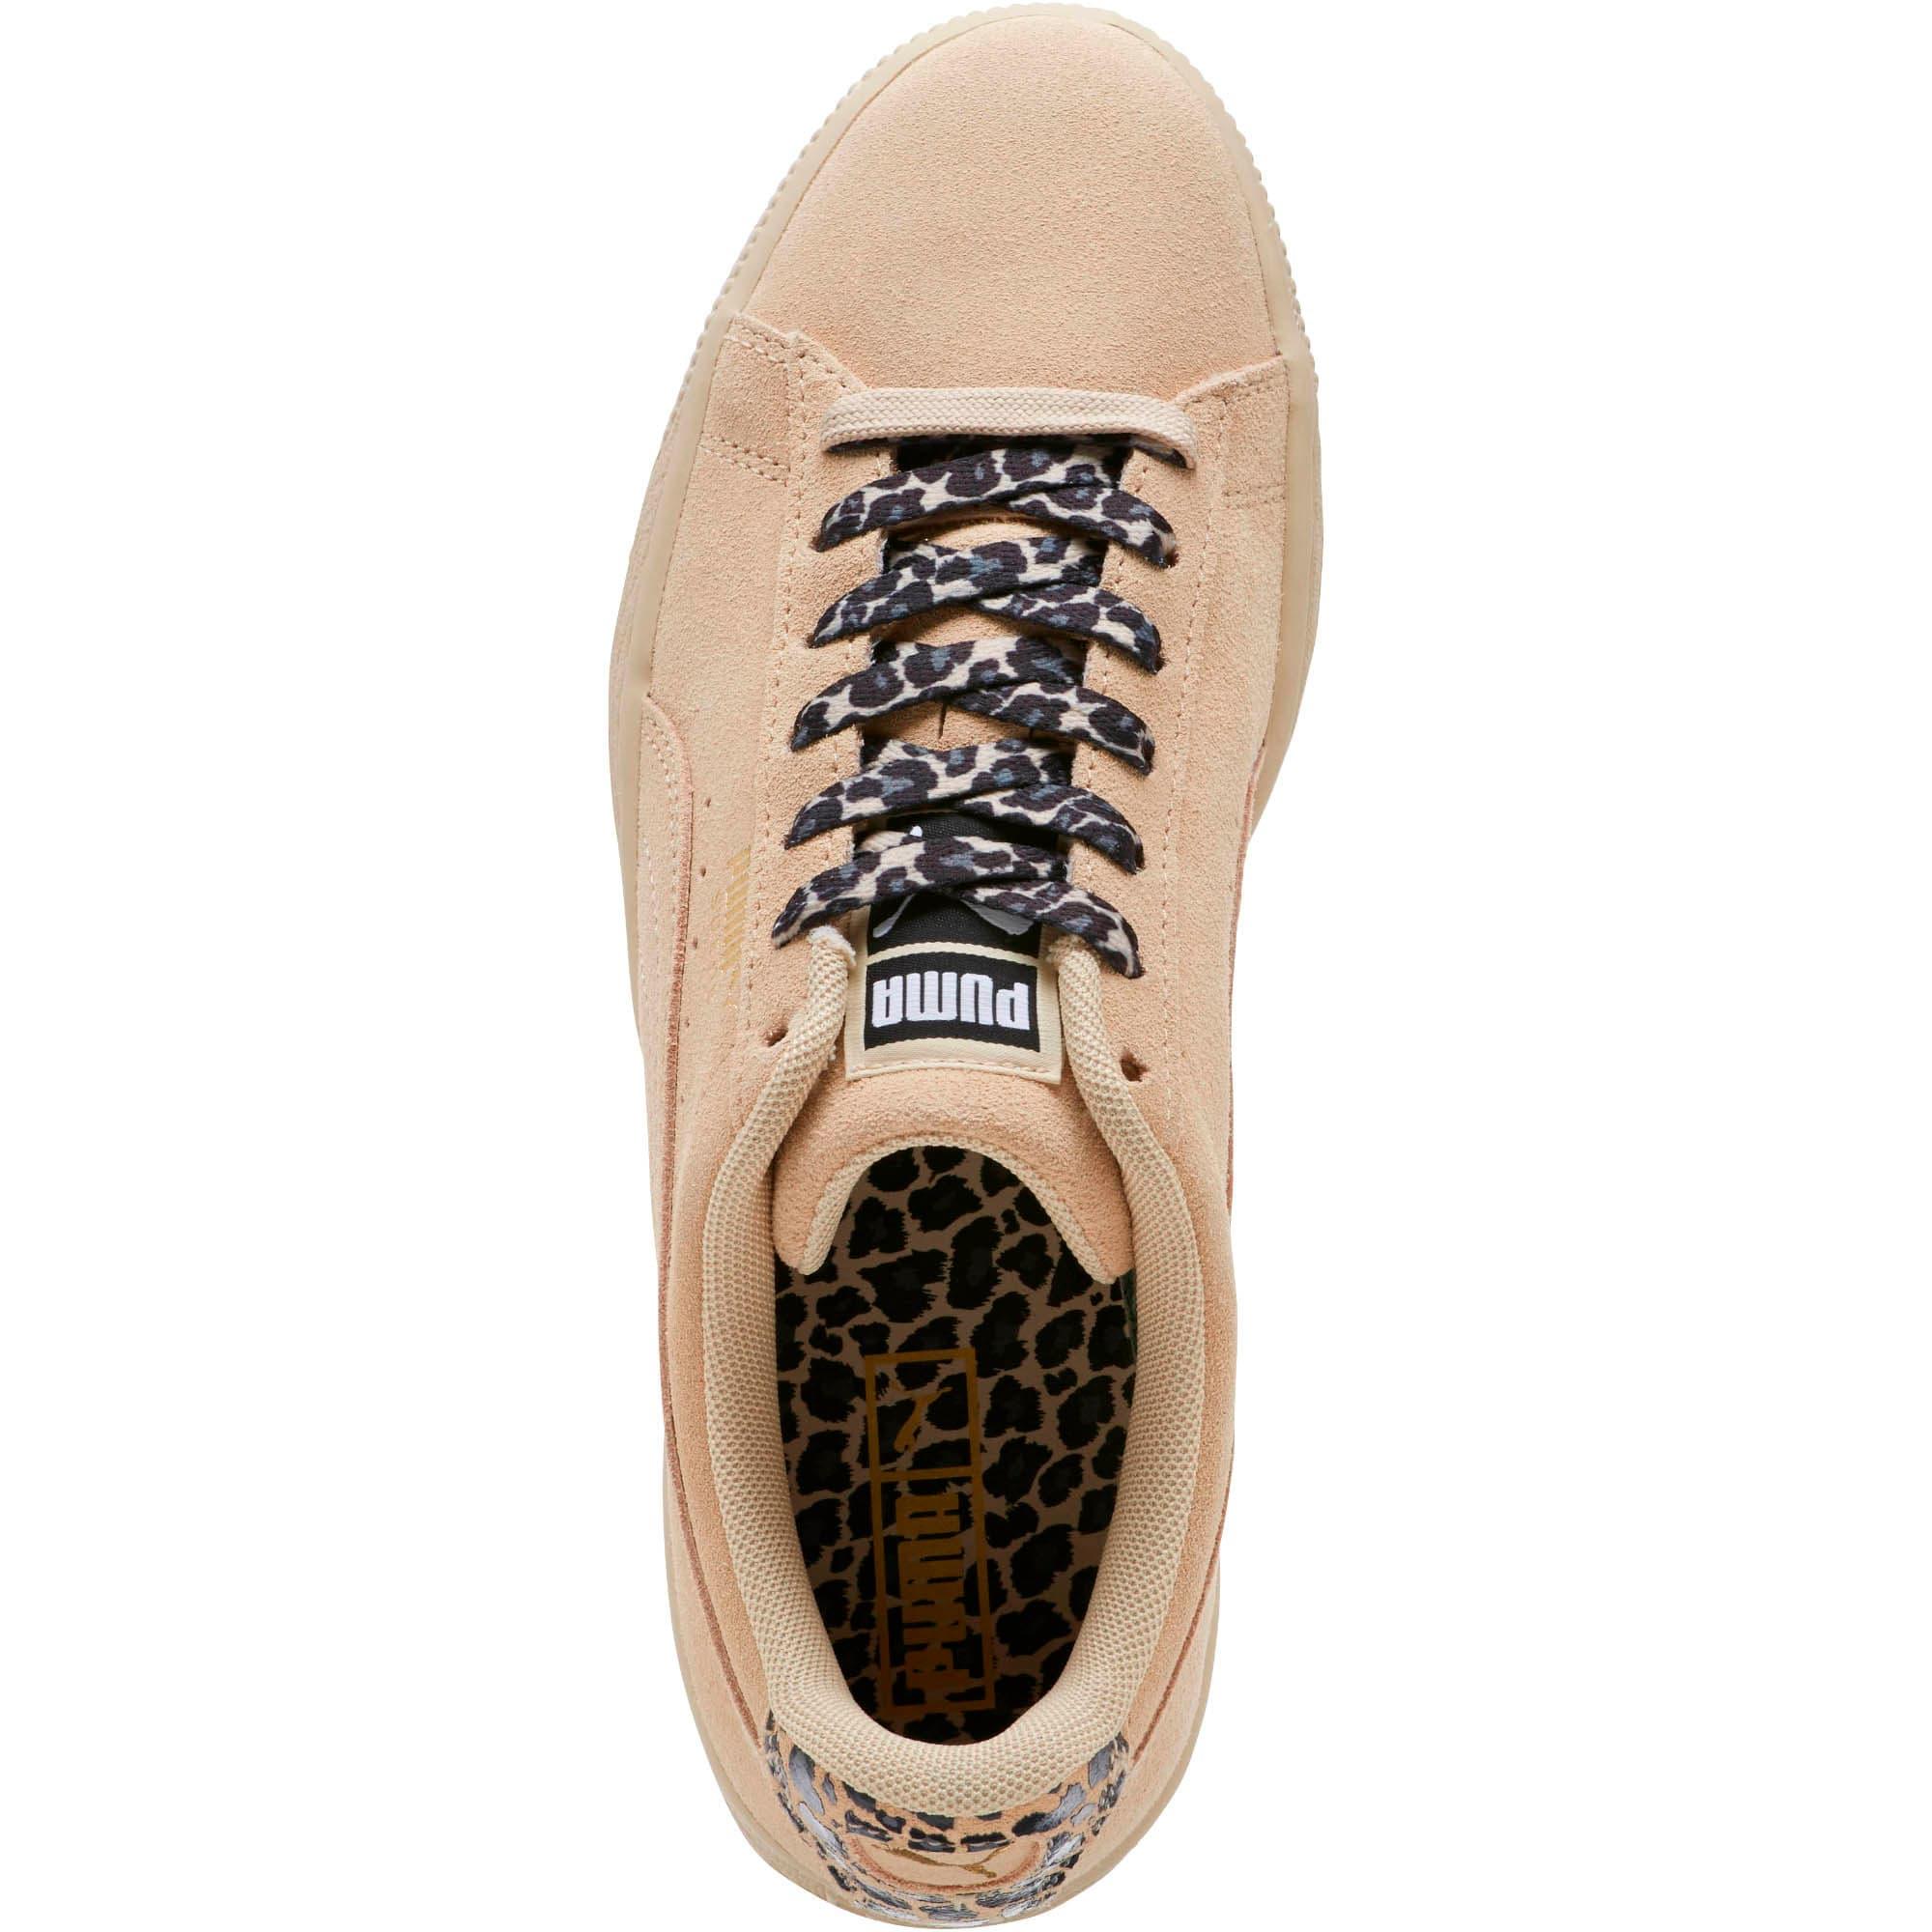 Thumbnail 5 of Suede Wild Women's Sneakers, Pebble- Gold-Puma Black, medium